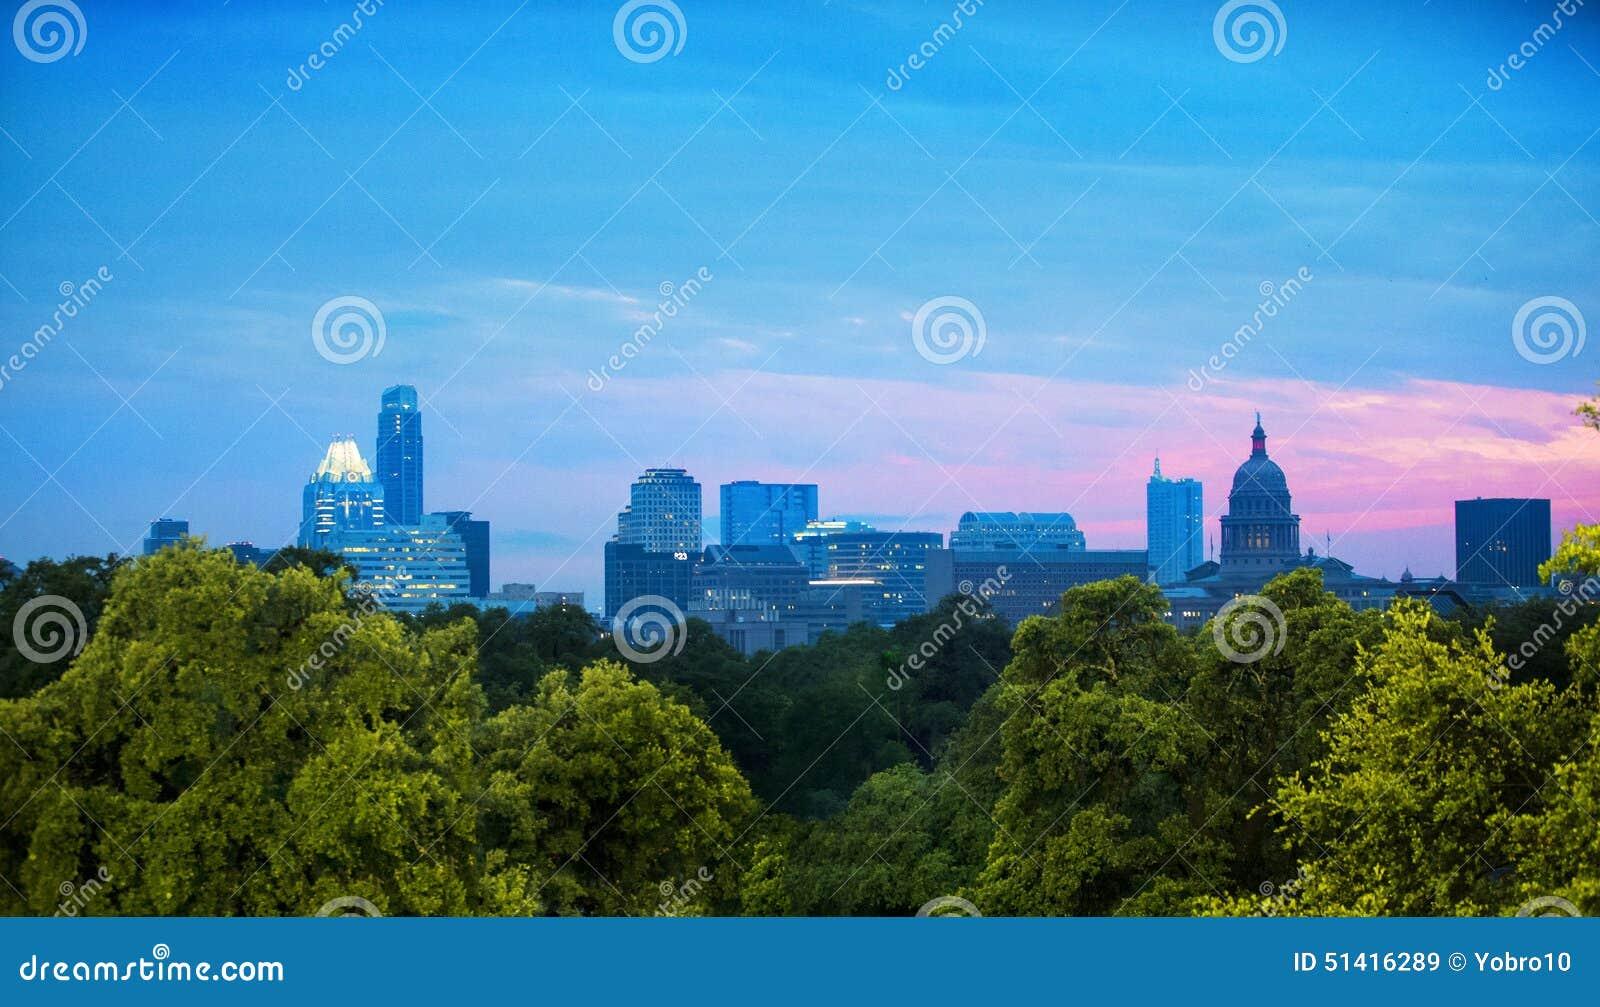 Skyline de Austin, Texas